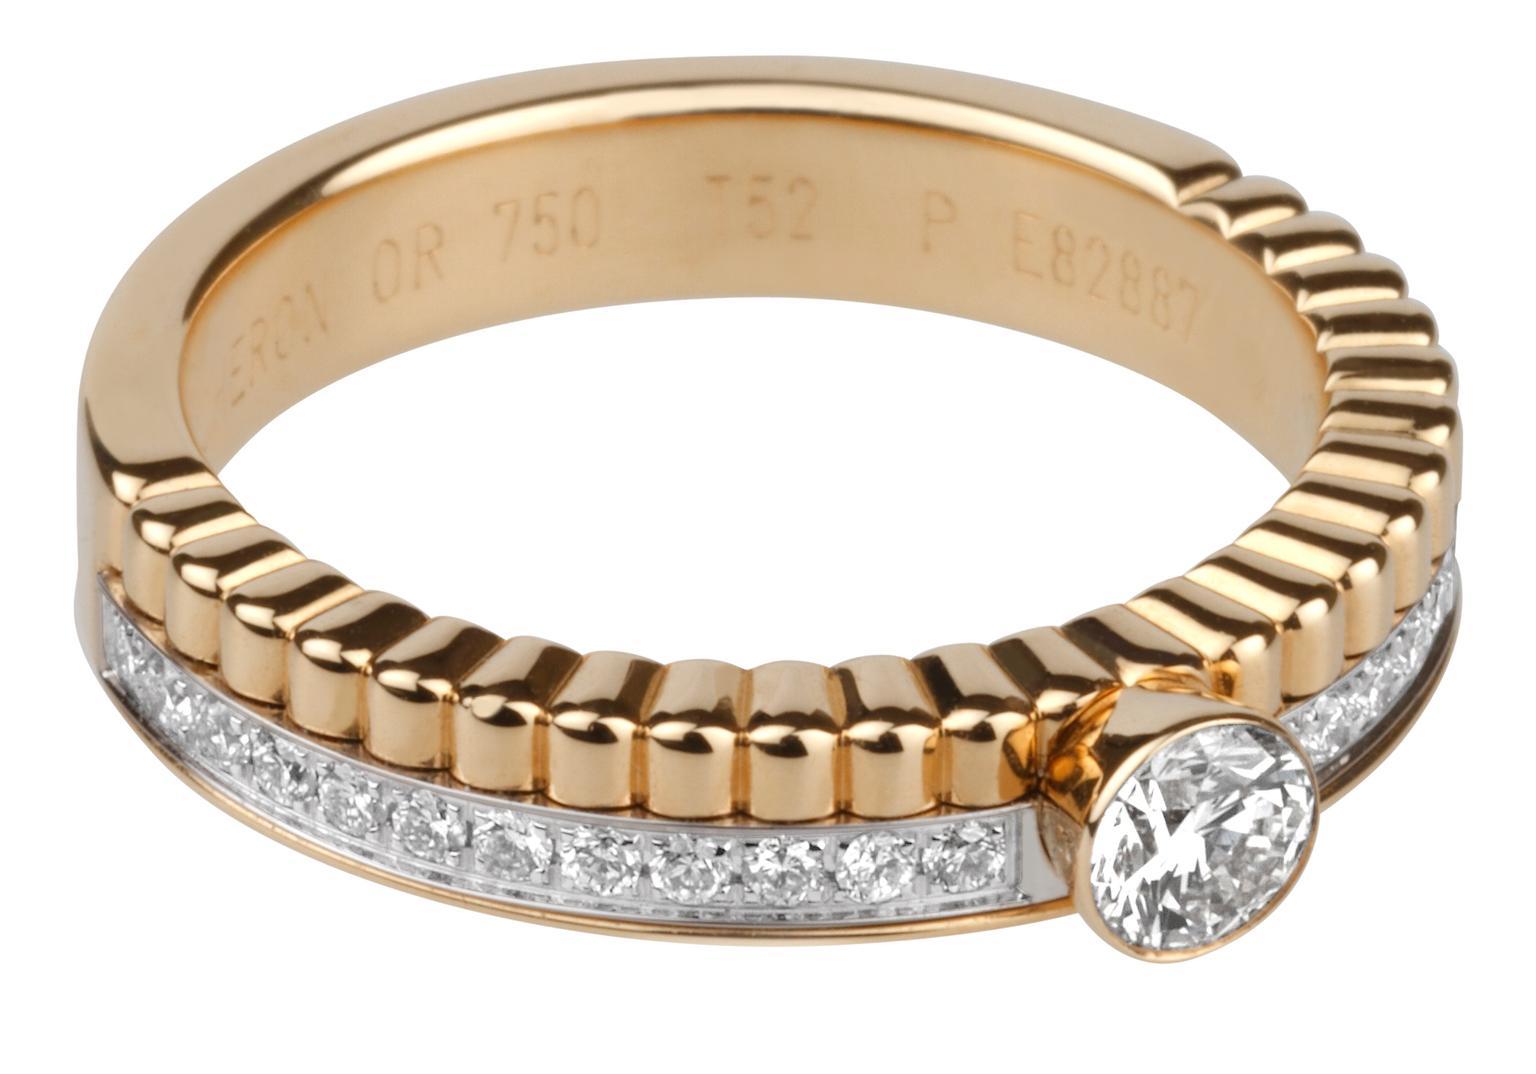 Quatre Follies Solitaire Diamond Ring Boucheron The